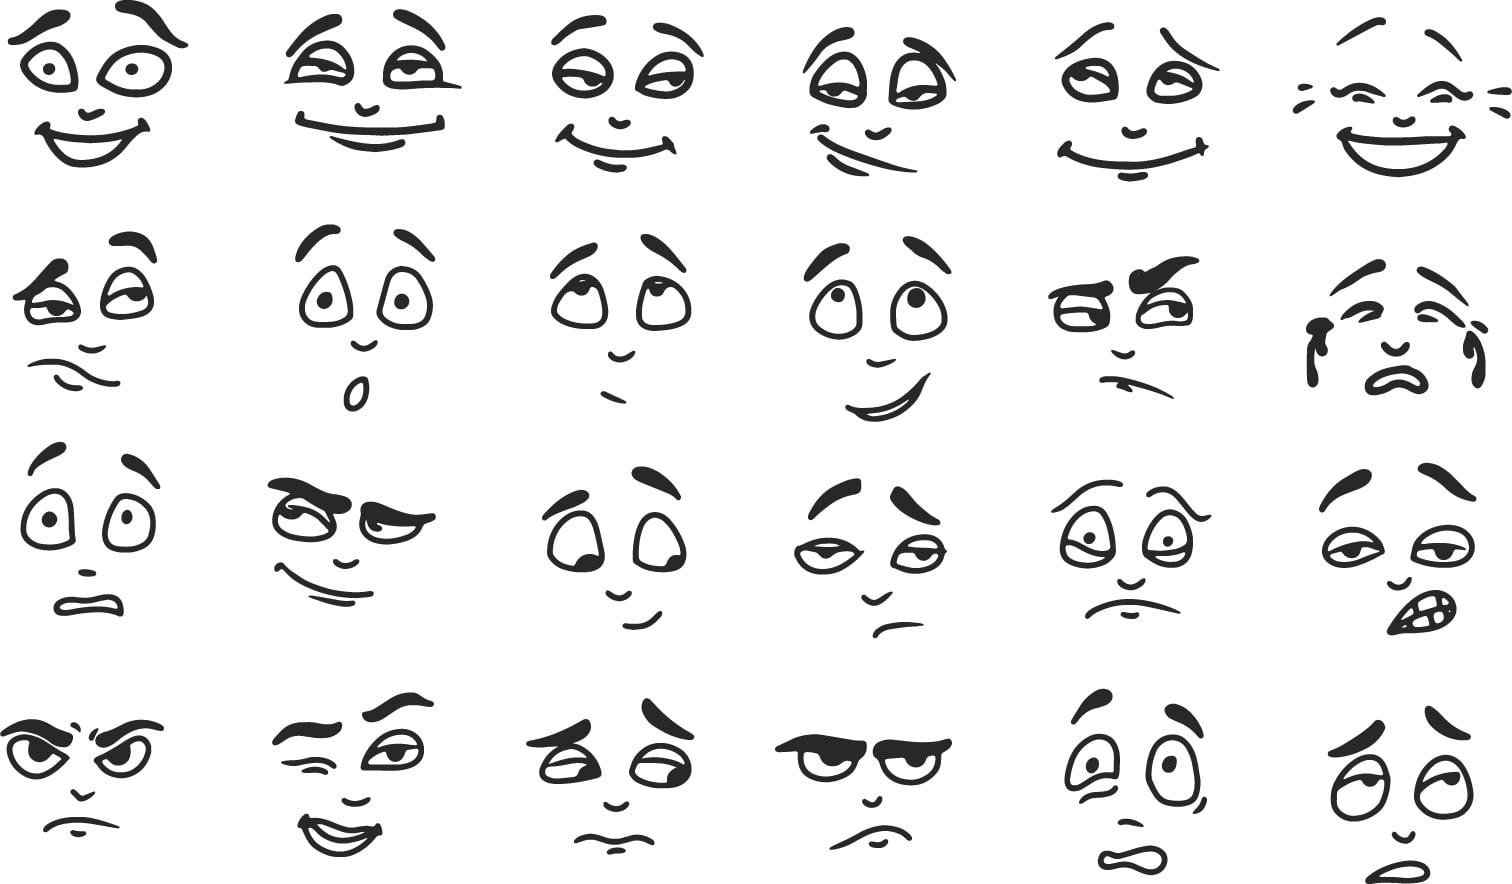 Facial expression illustration set